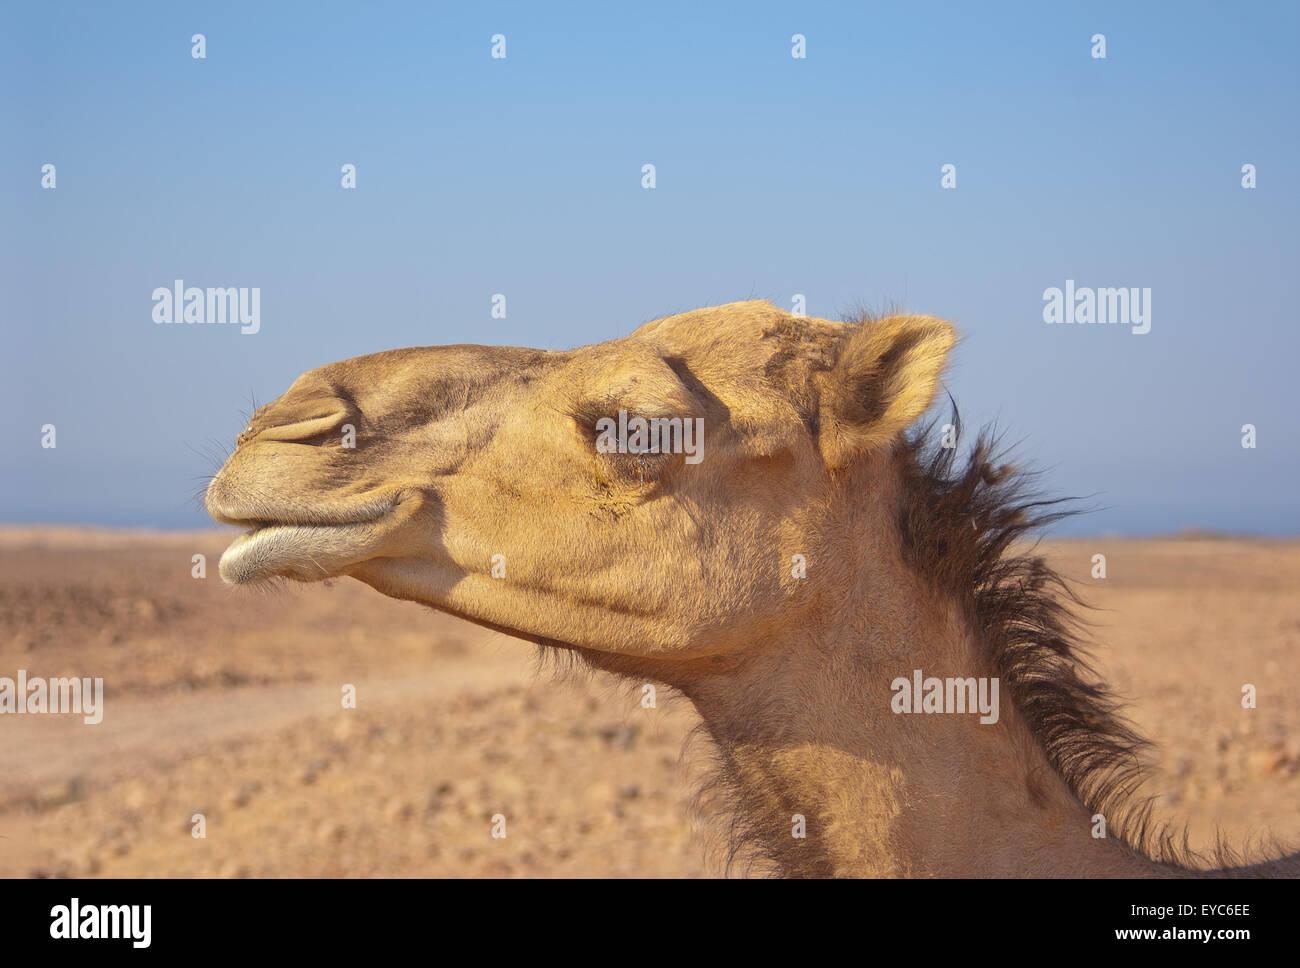 e371c2775746 Camel In Outback Stockfotos & Camel In Outback Bilder - Alamy